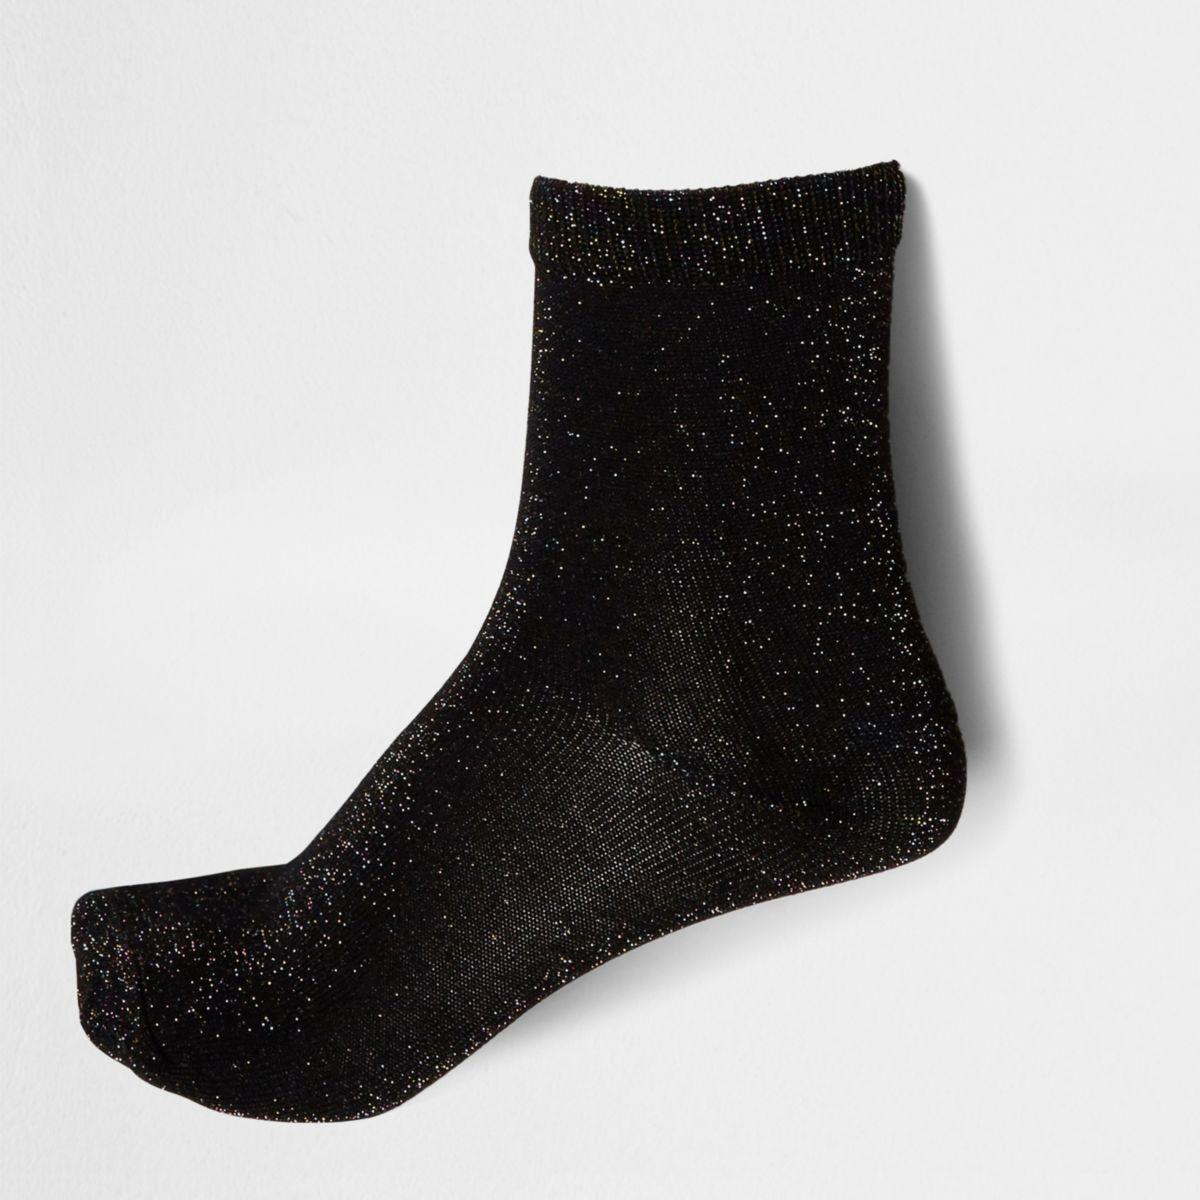 Black lurex stitch ankle socks